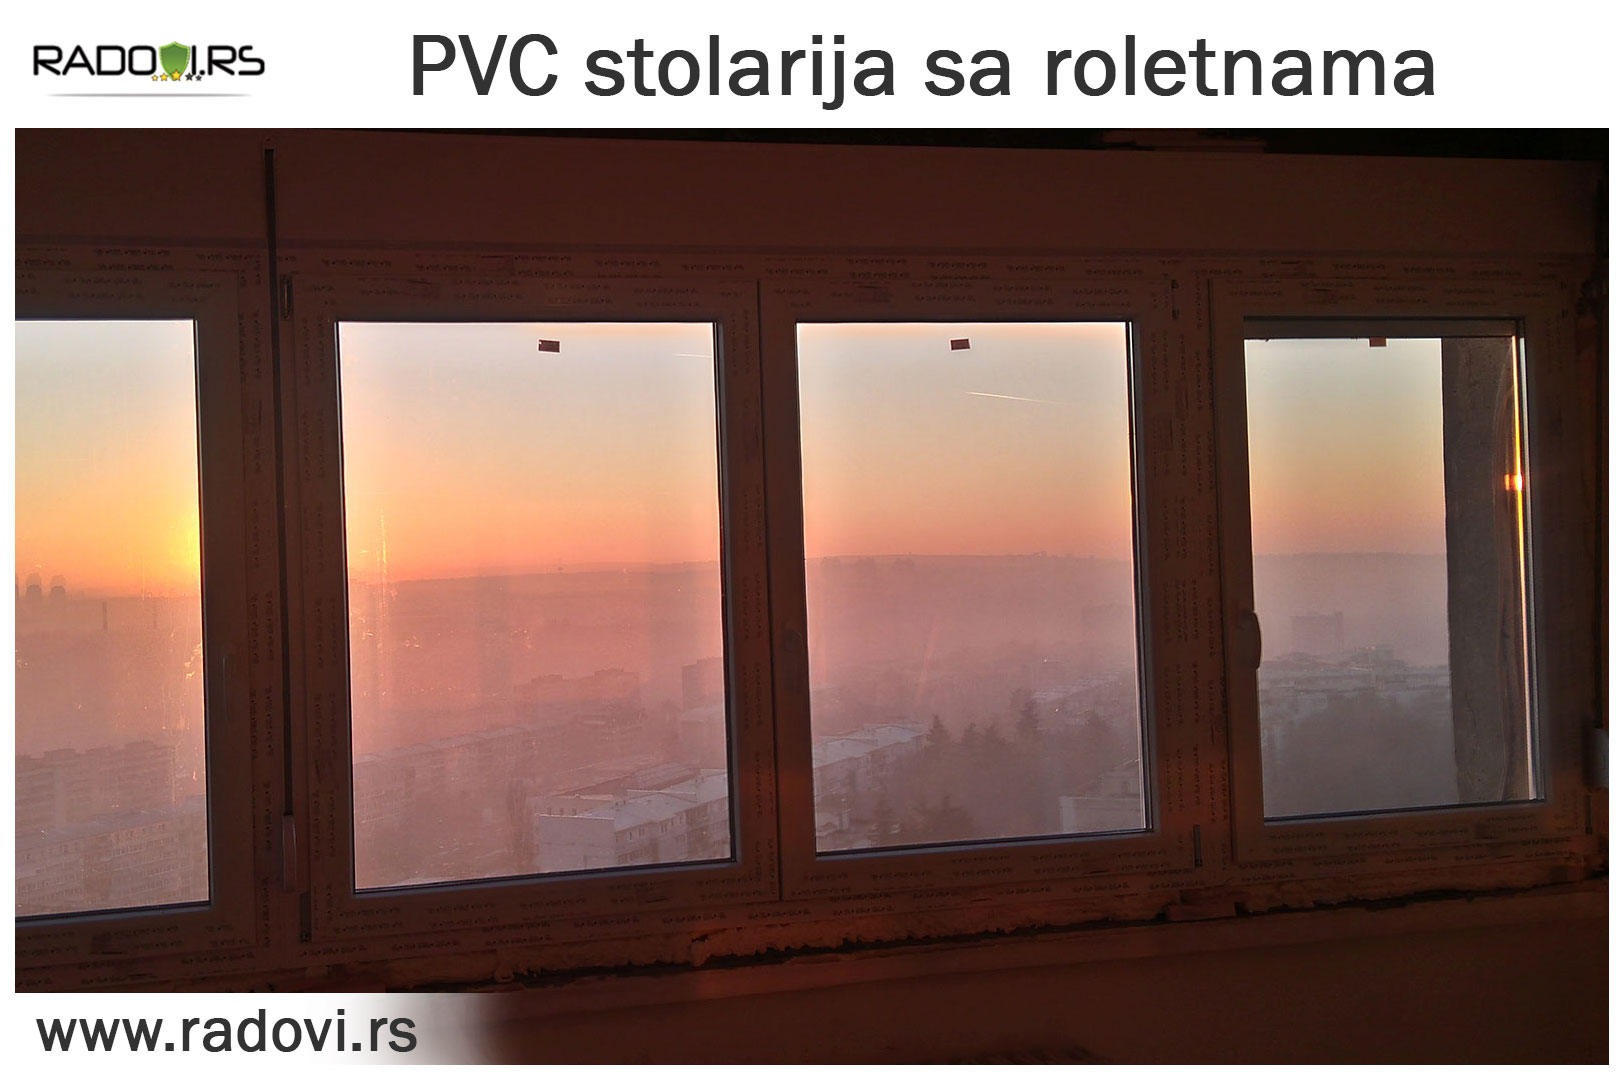 PVC stolarija sa roletnama - PVC stolarija Tim - Radovi.rs